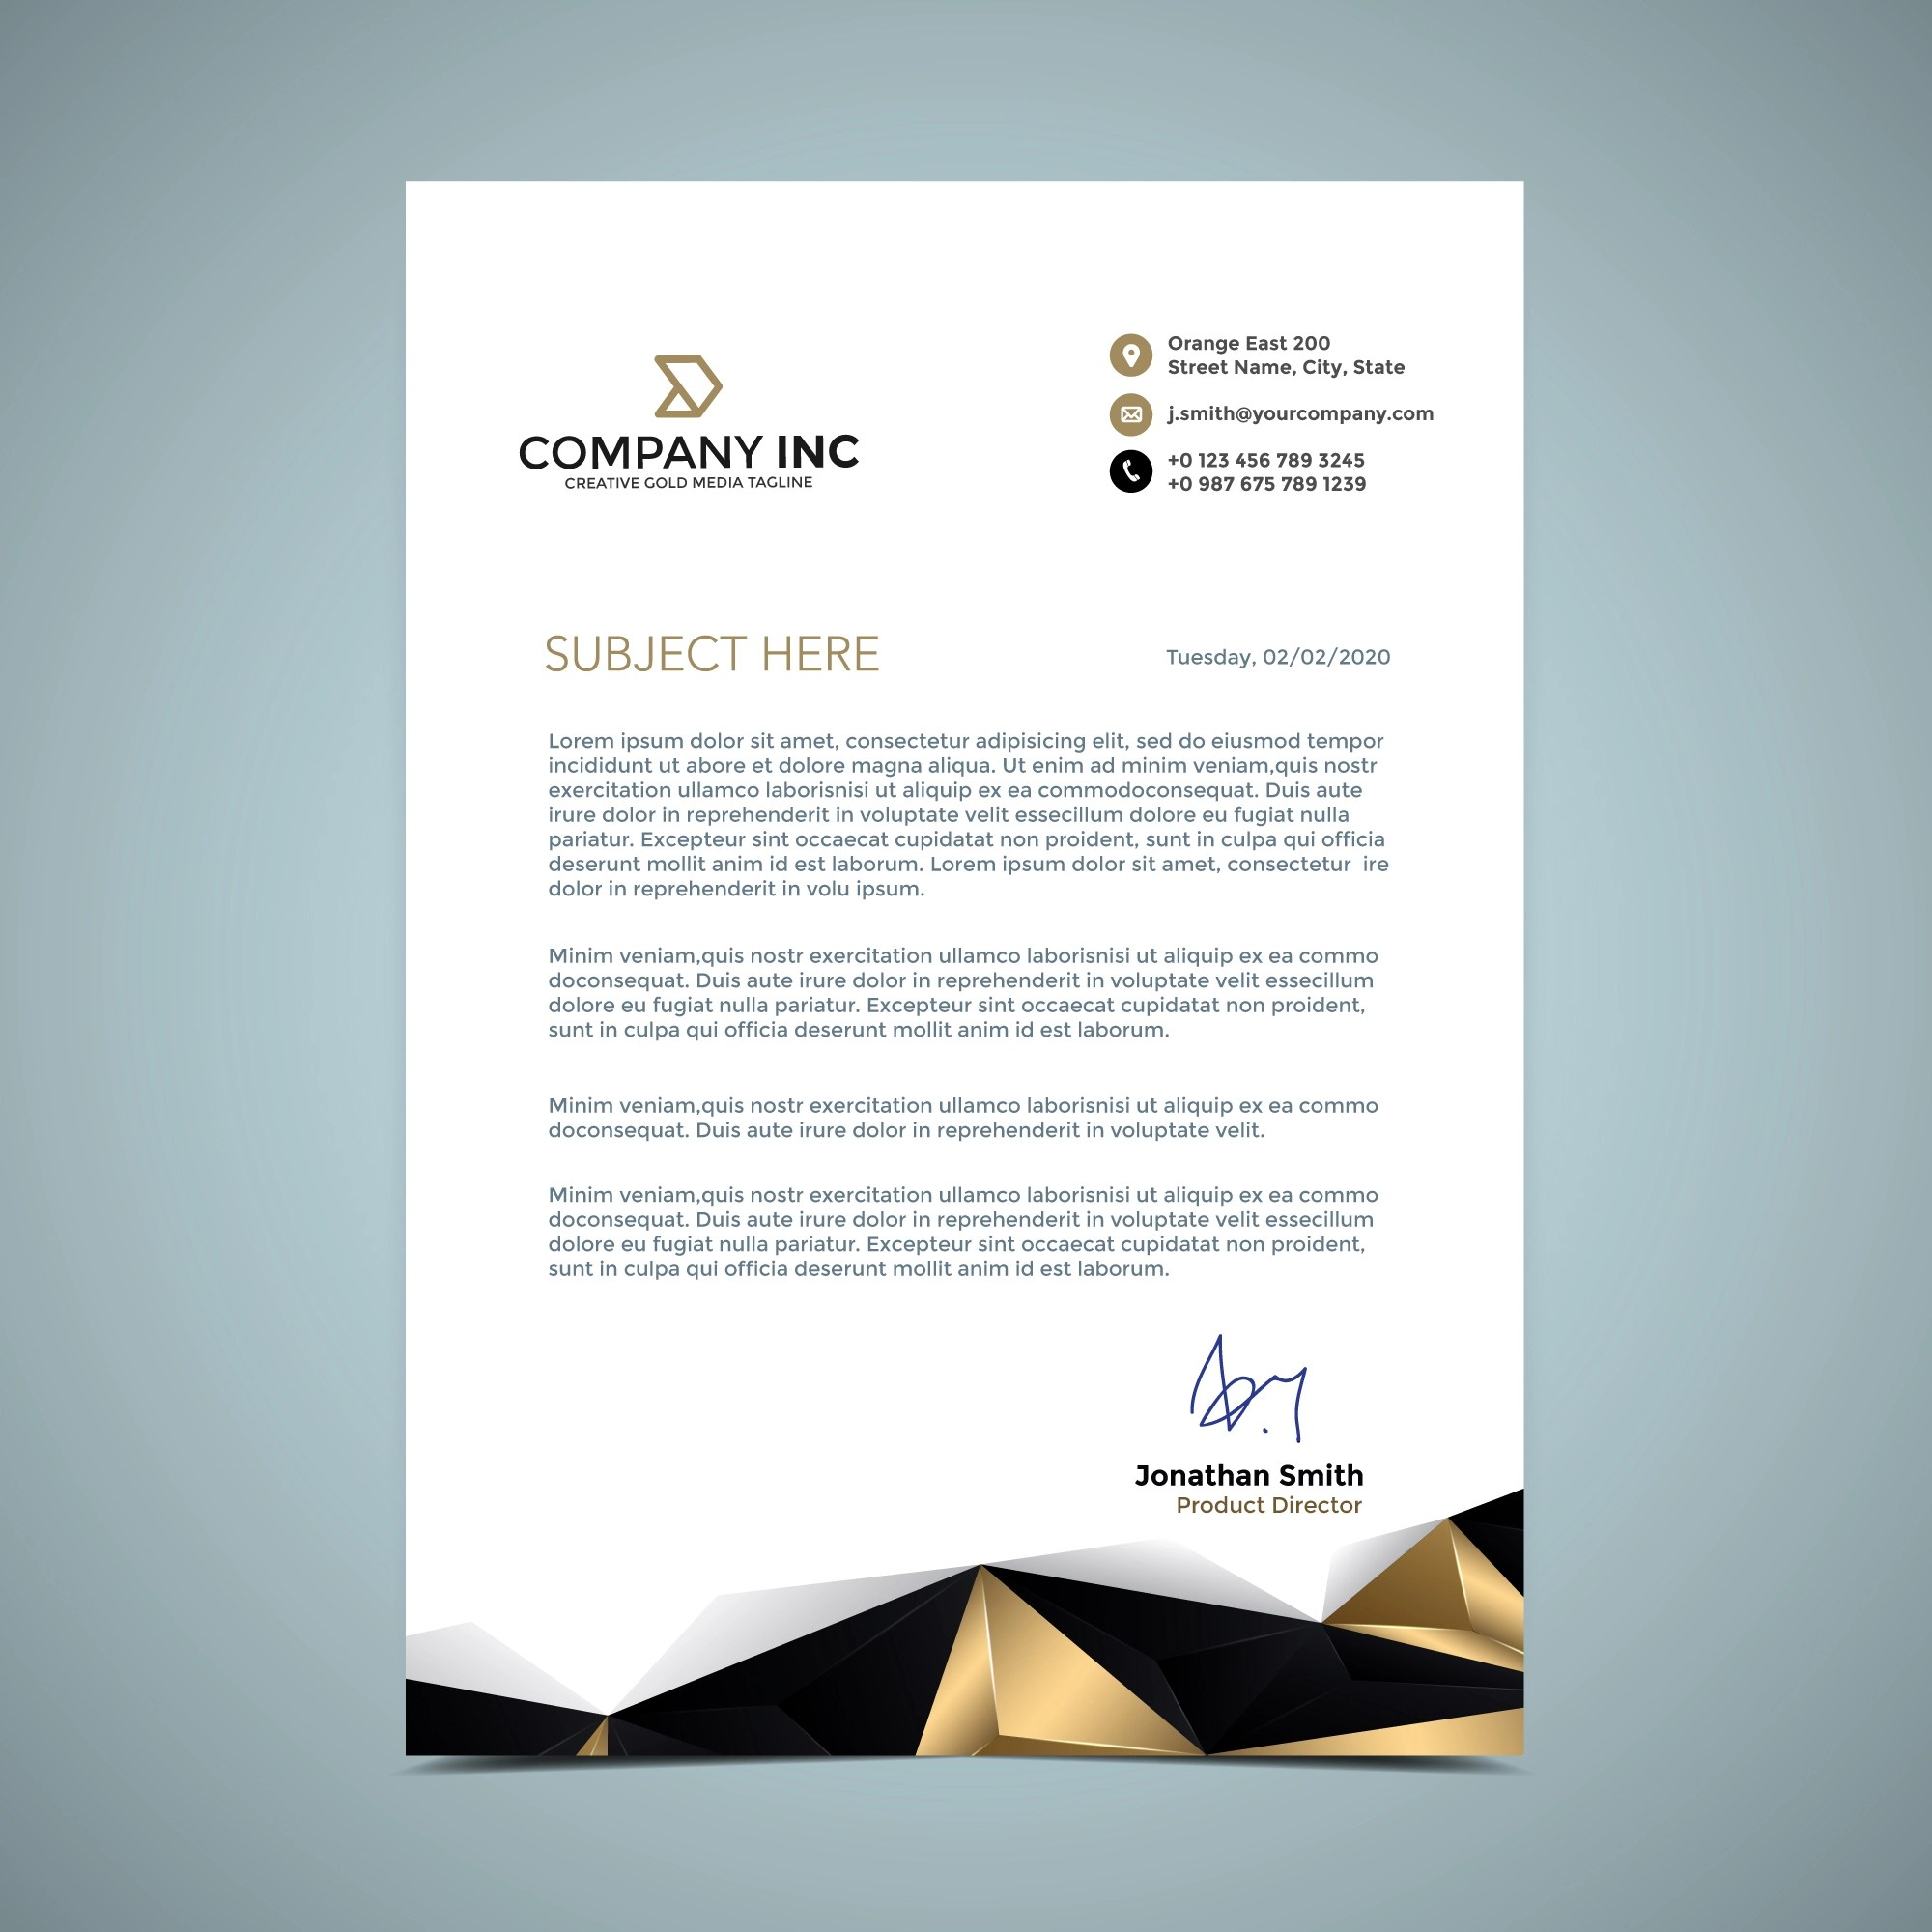 Golden Letterhead Design  Download Free Vector Art Stock Graphics  Images